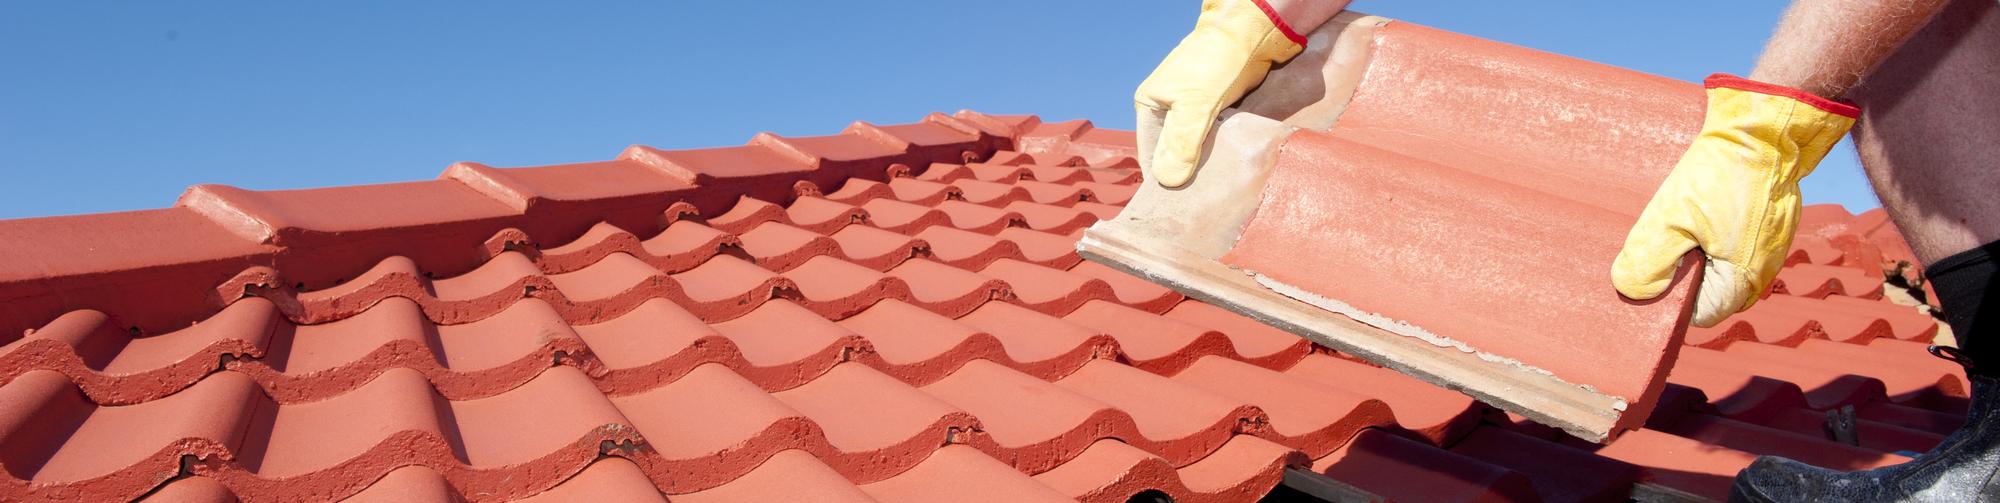 Man placing tile roof